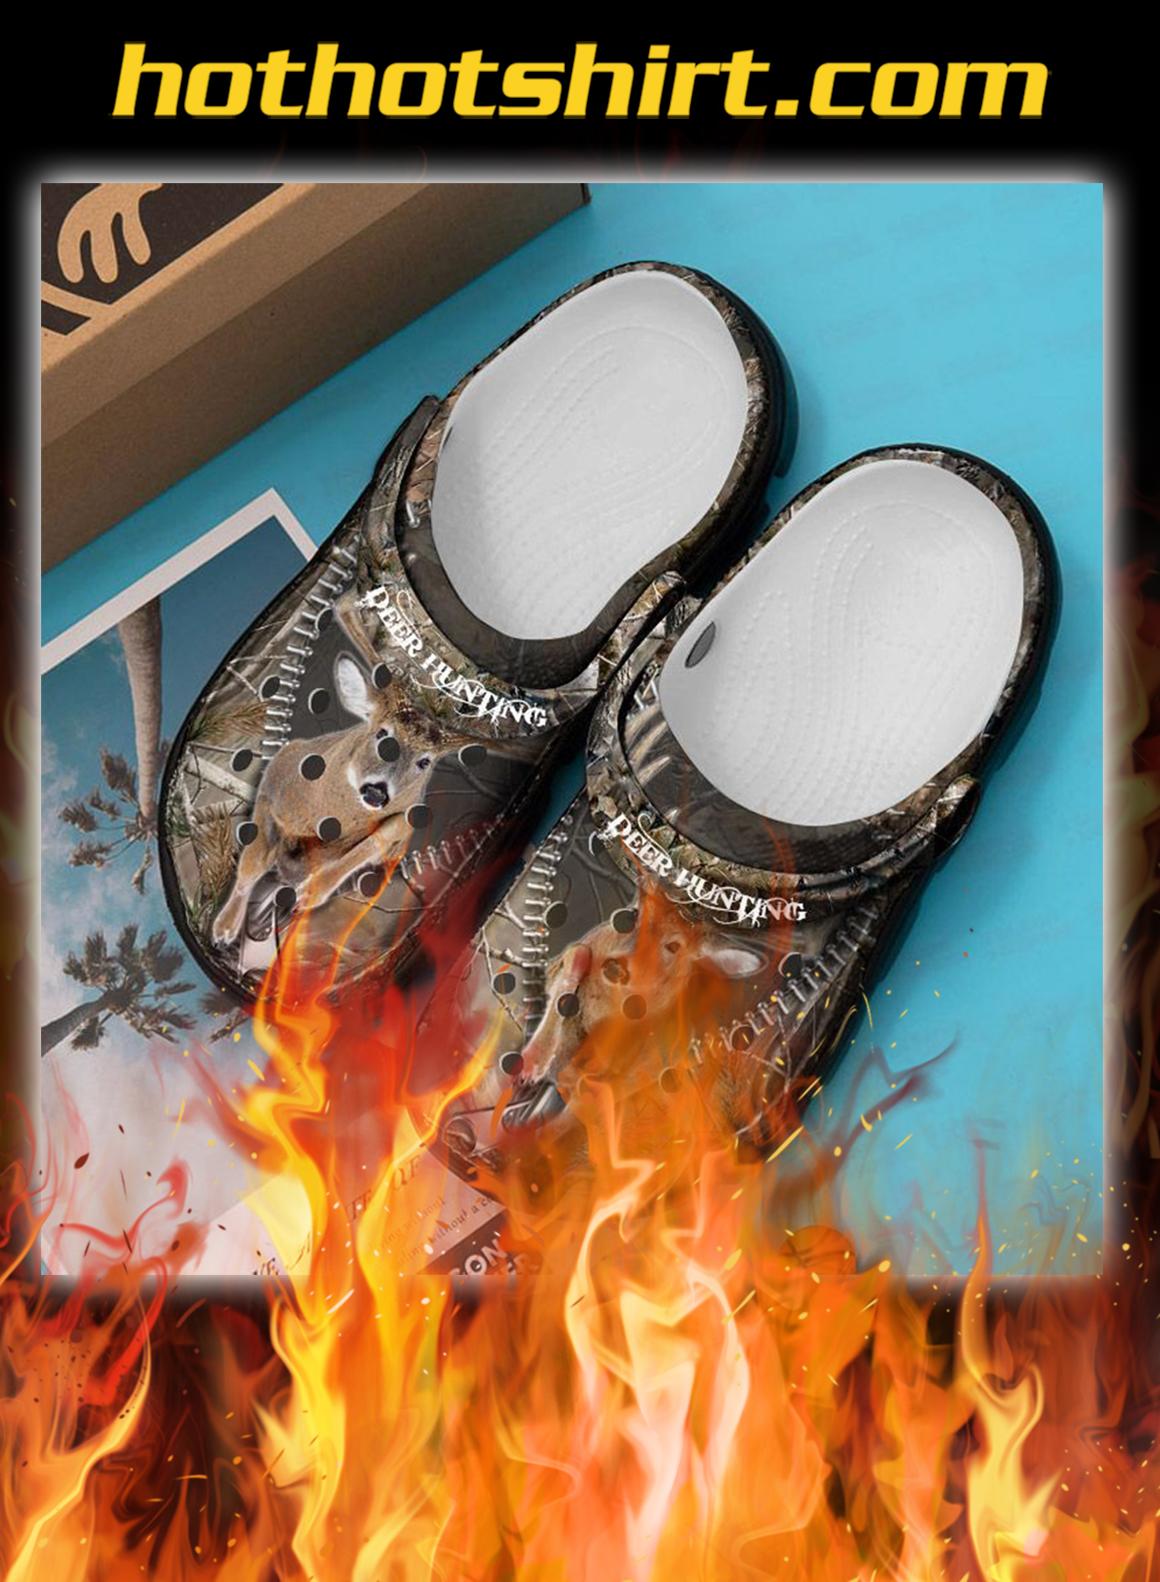 Deer hunting crocs crocband shoes- pic 1